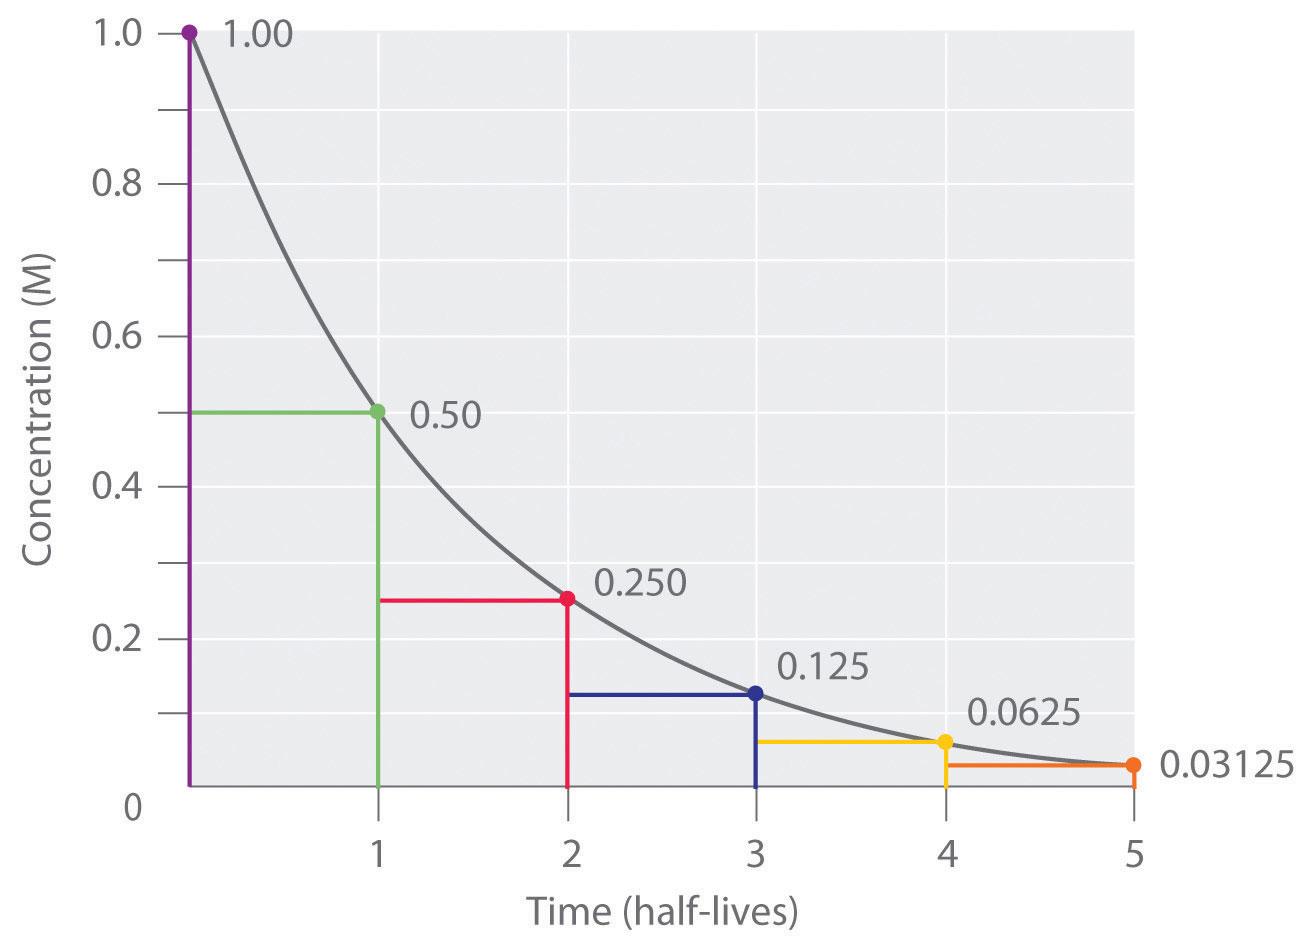 Worksheet 54 Half Life Calculations